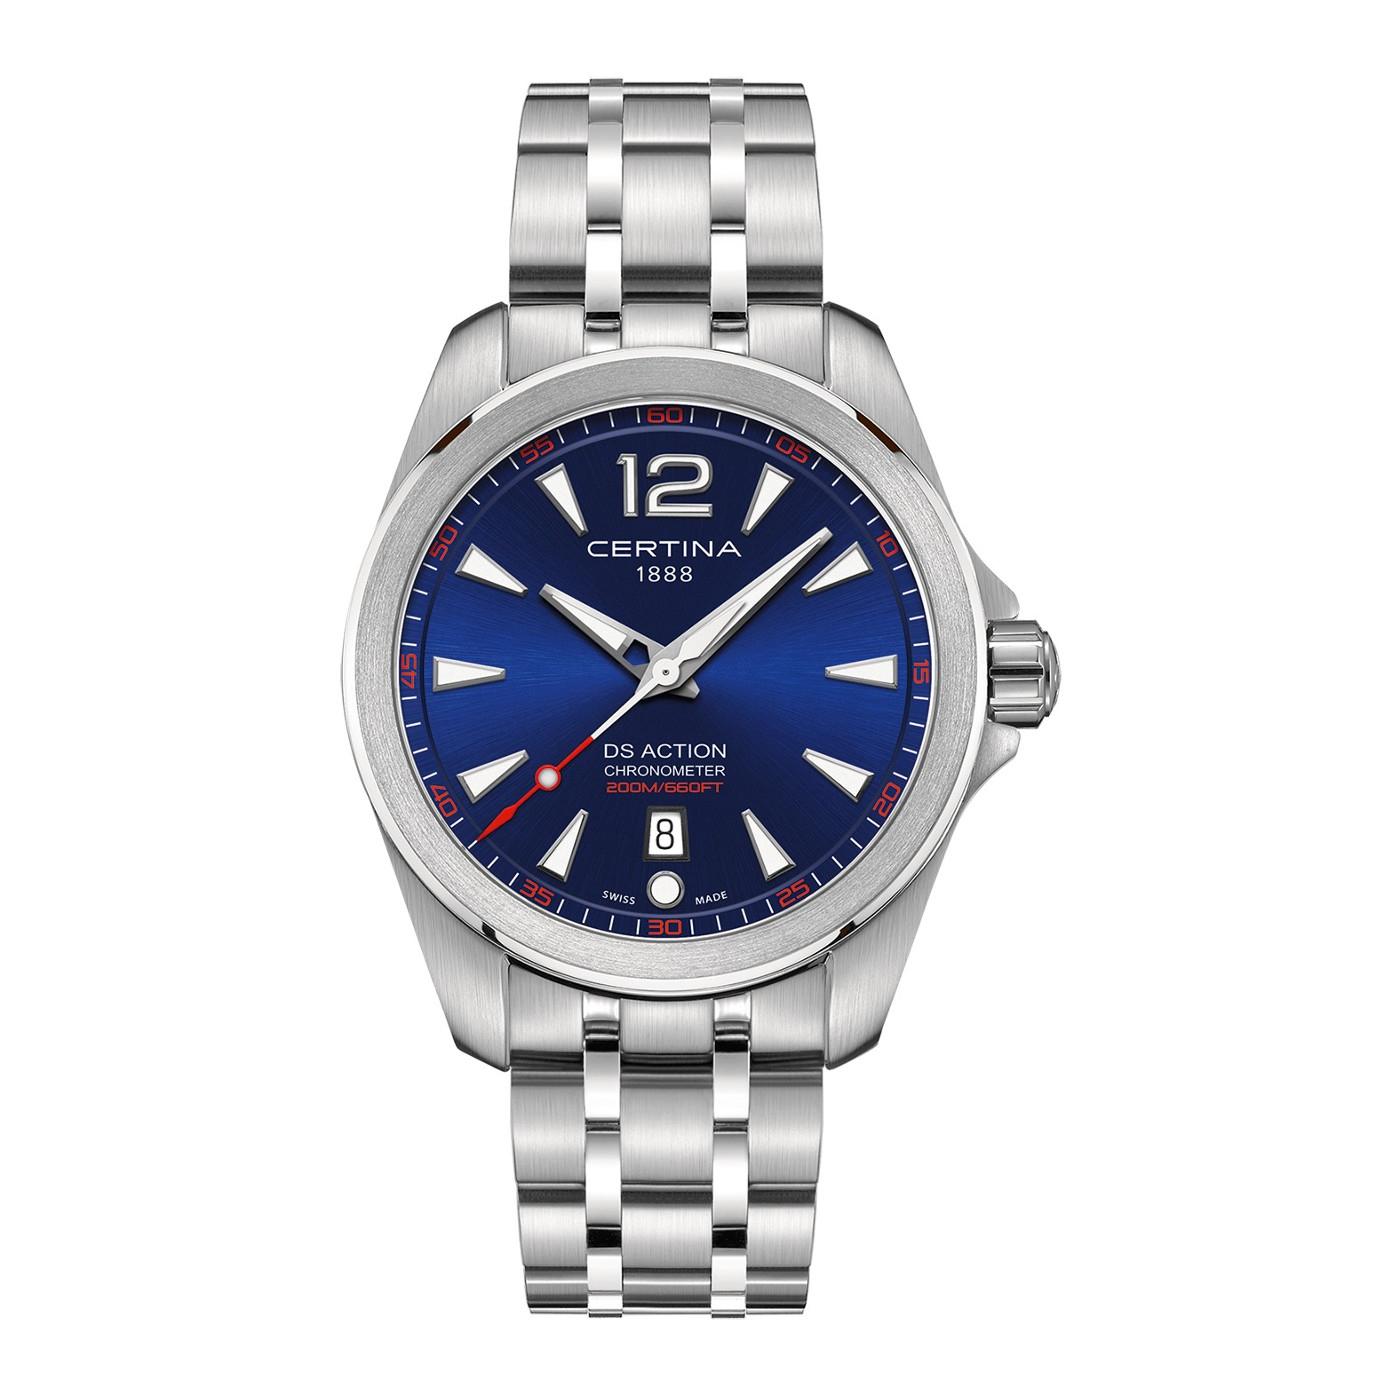 Afbeelding van Certina Aqua Action Diver horloge C032.851.11.047.00